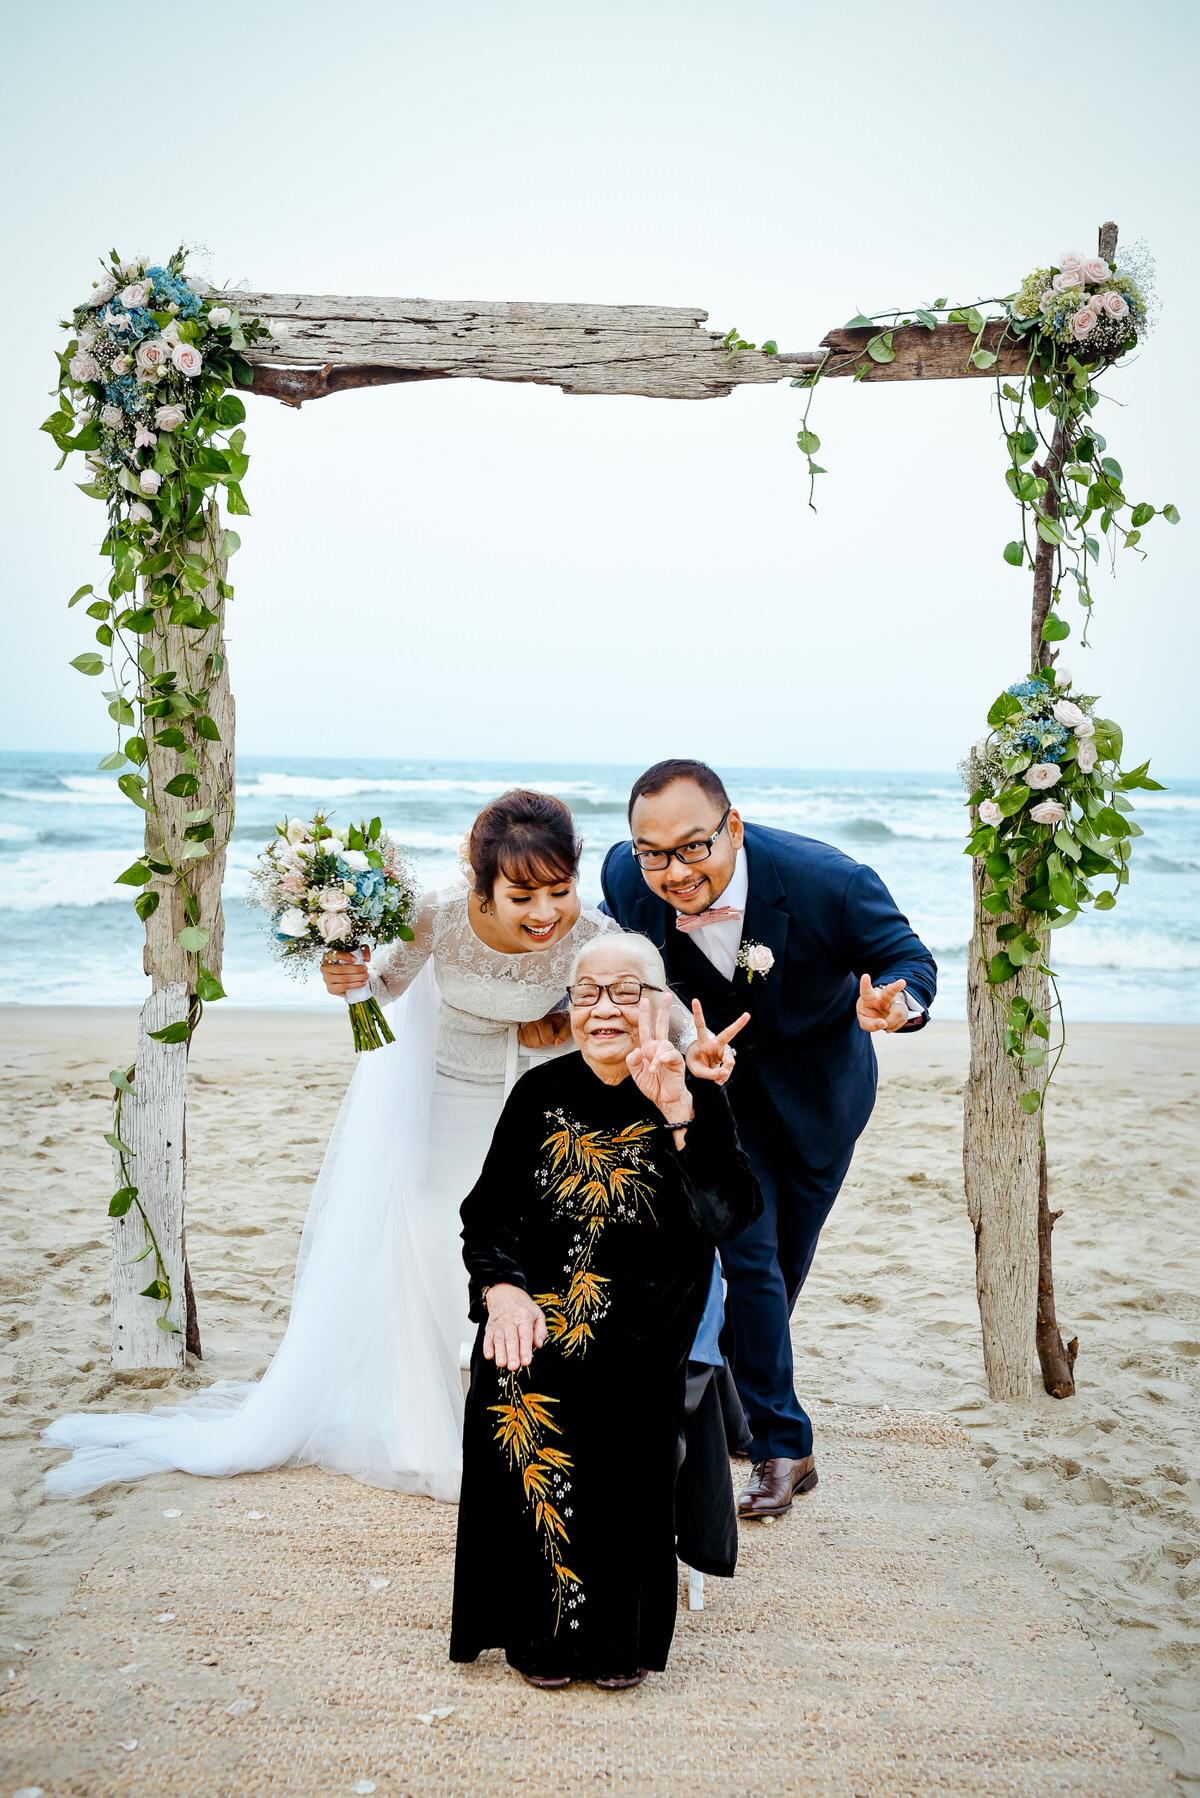 Danang-Viet Nam-Wedding-Photographer_112.jpg